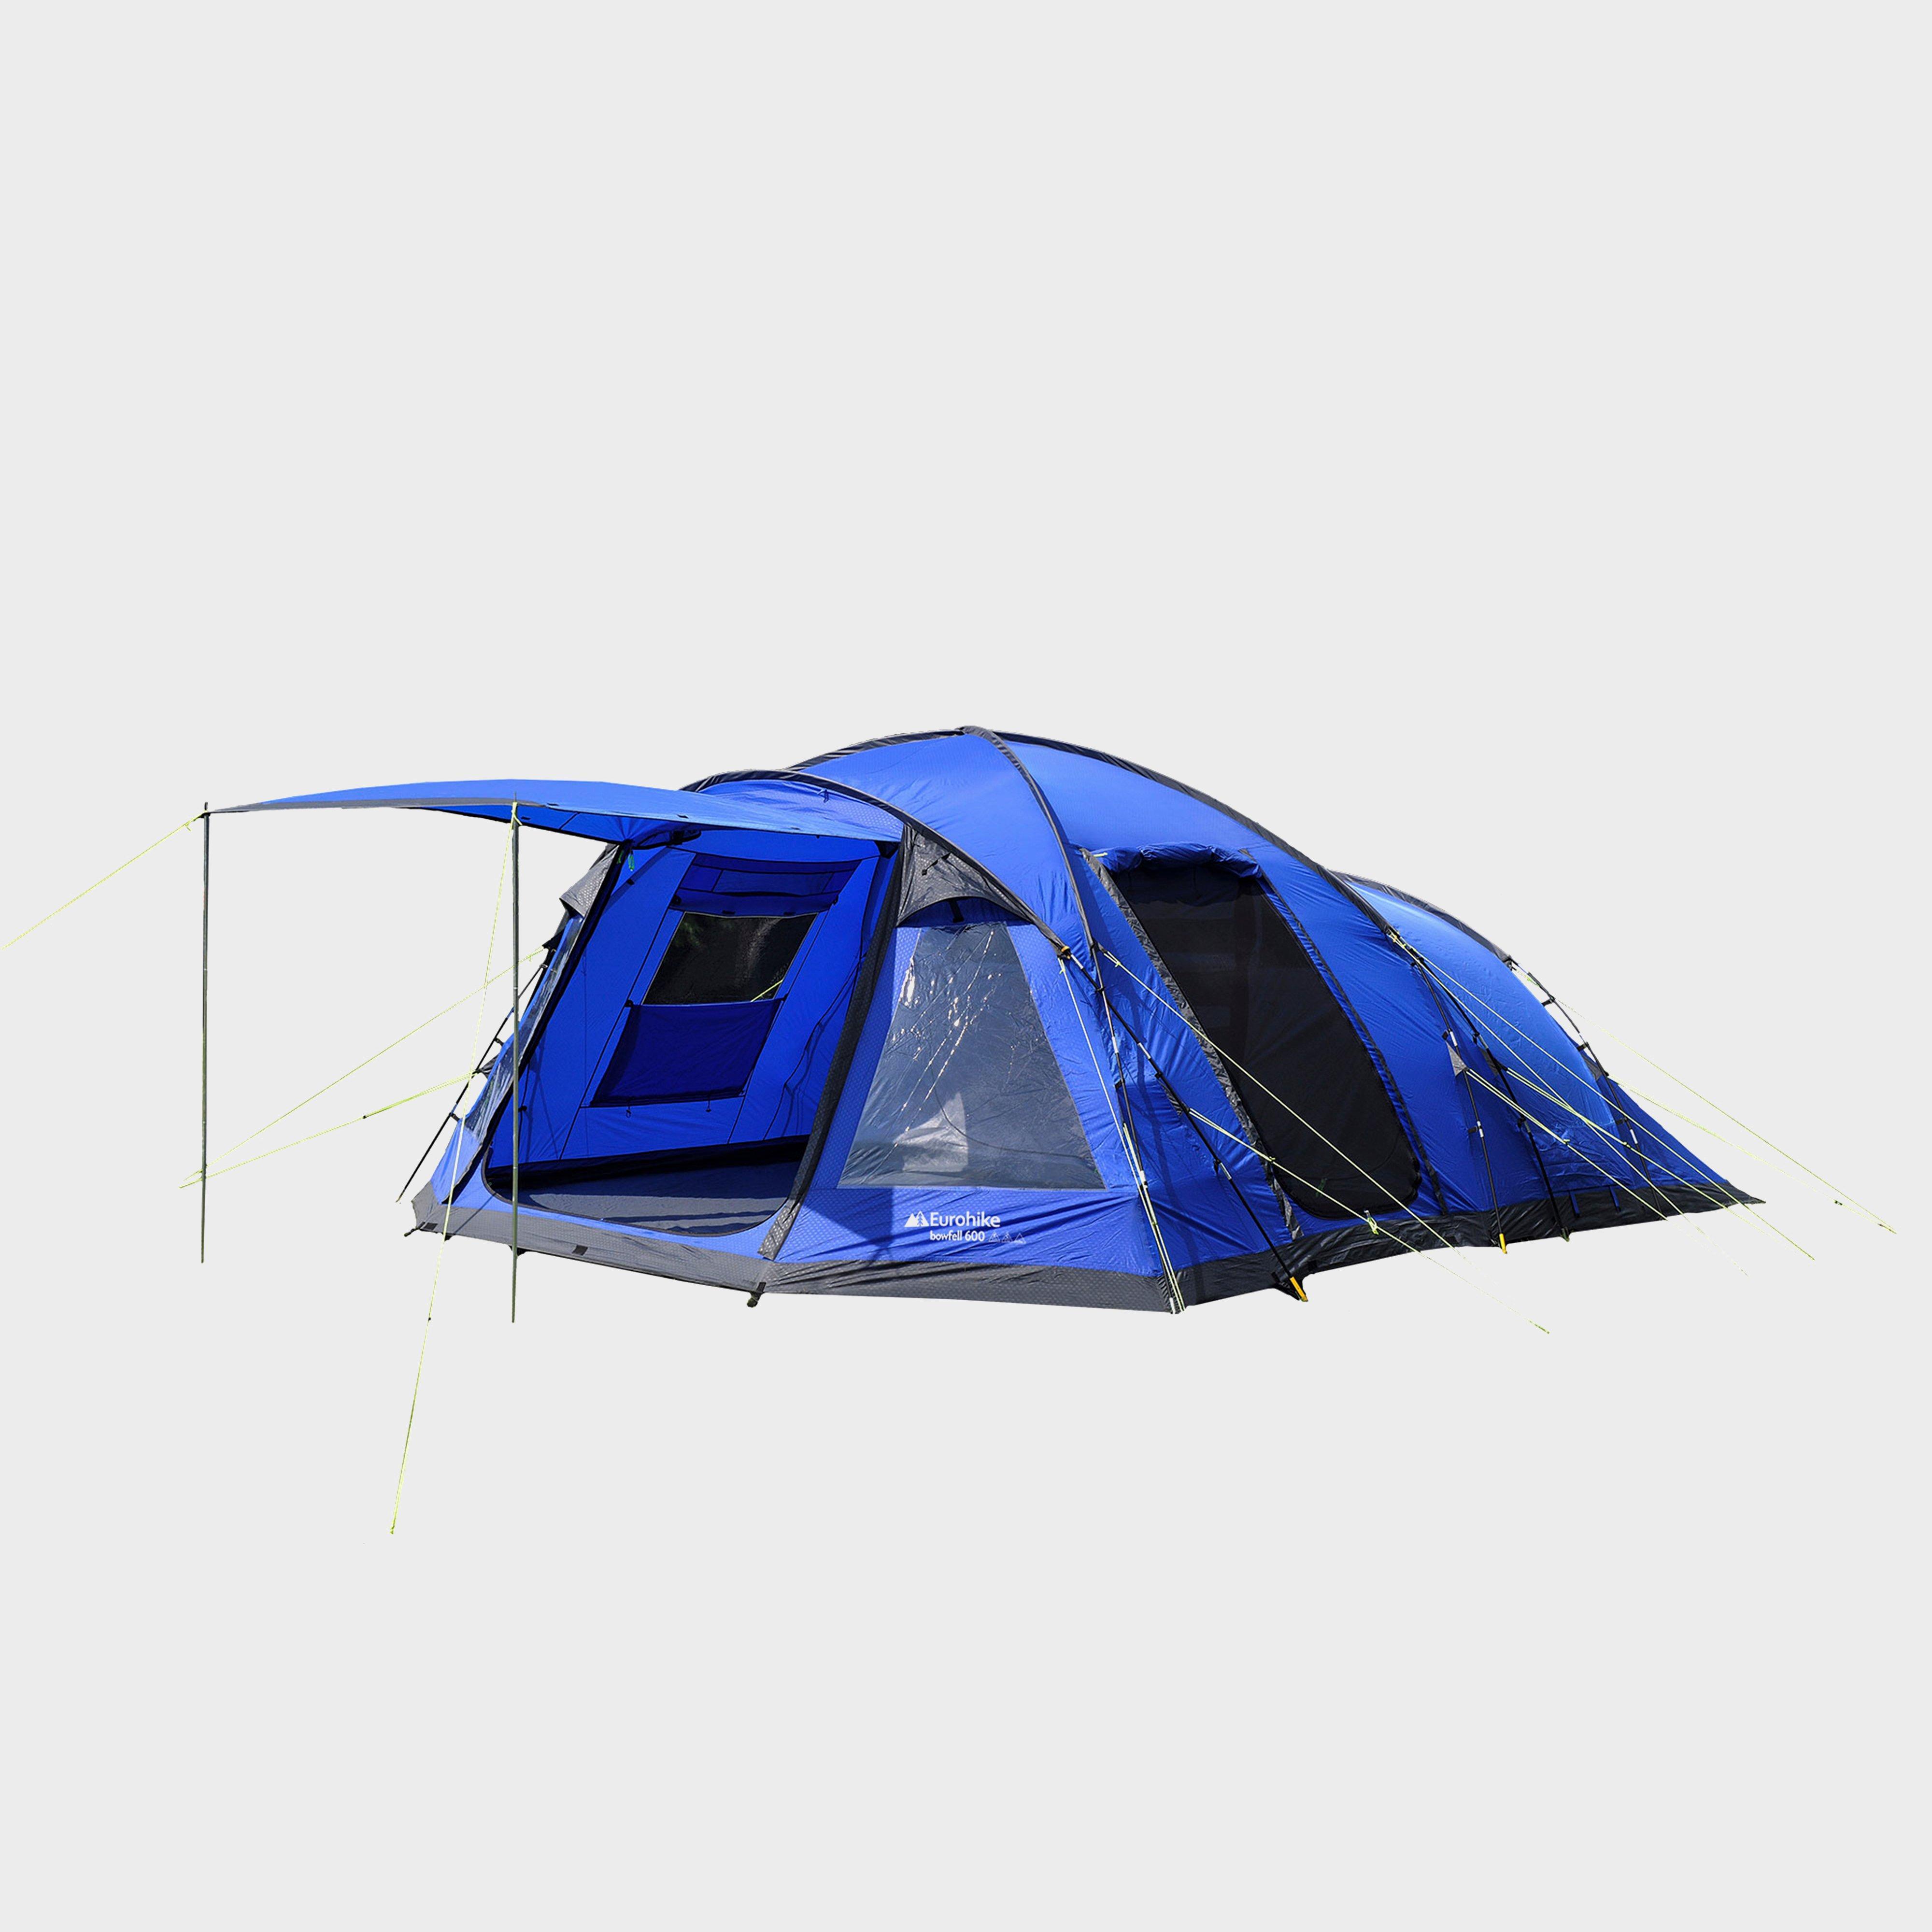 EUROHIKE Bowfell 600 6 Person Tent & Family u0026 Group Tents | 4 5 6 u0026 8 Man Tents | Blacks